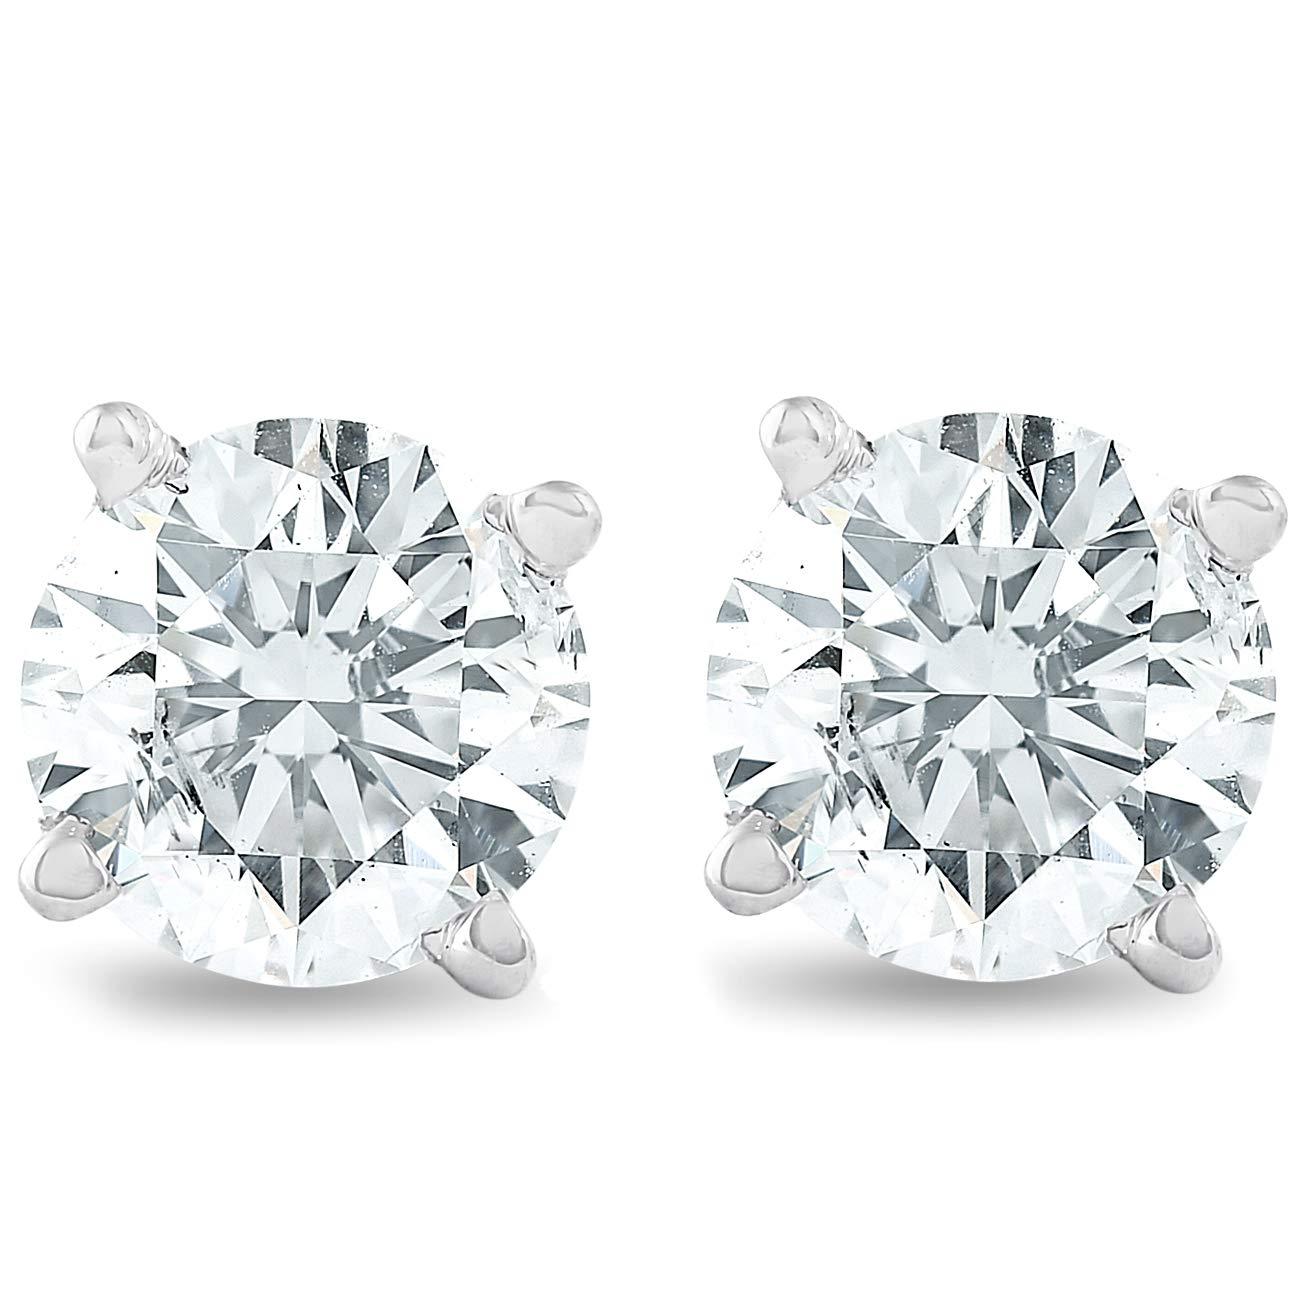 1 1/4 cttw Diamond Studs 14K White Gold IGI Certified Screw Back Earrings